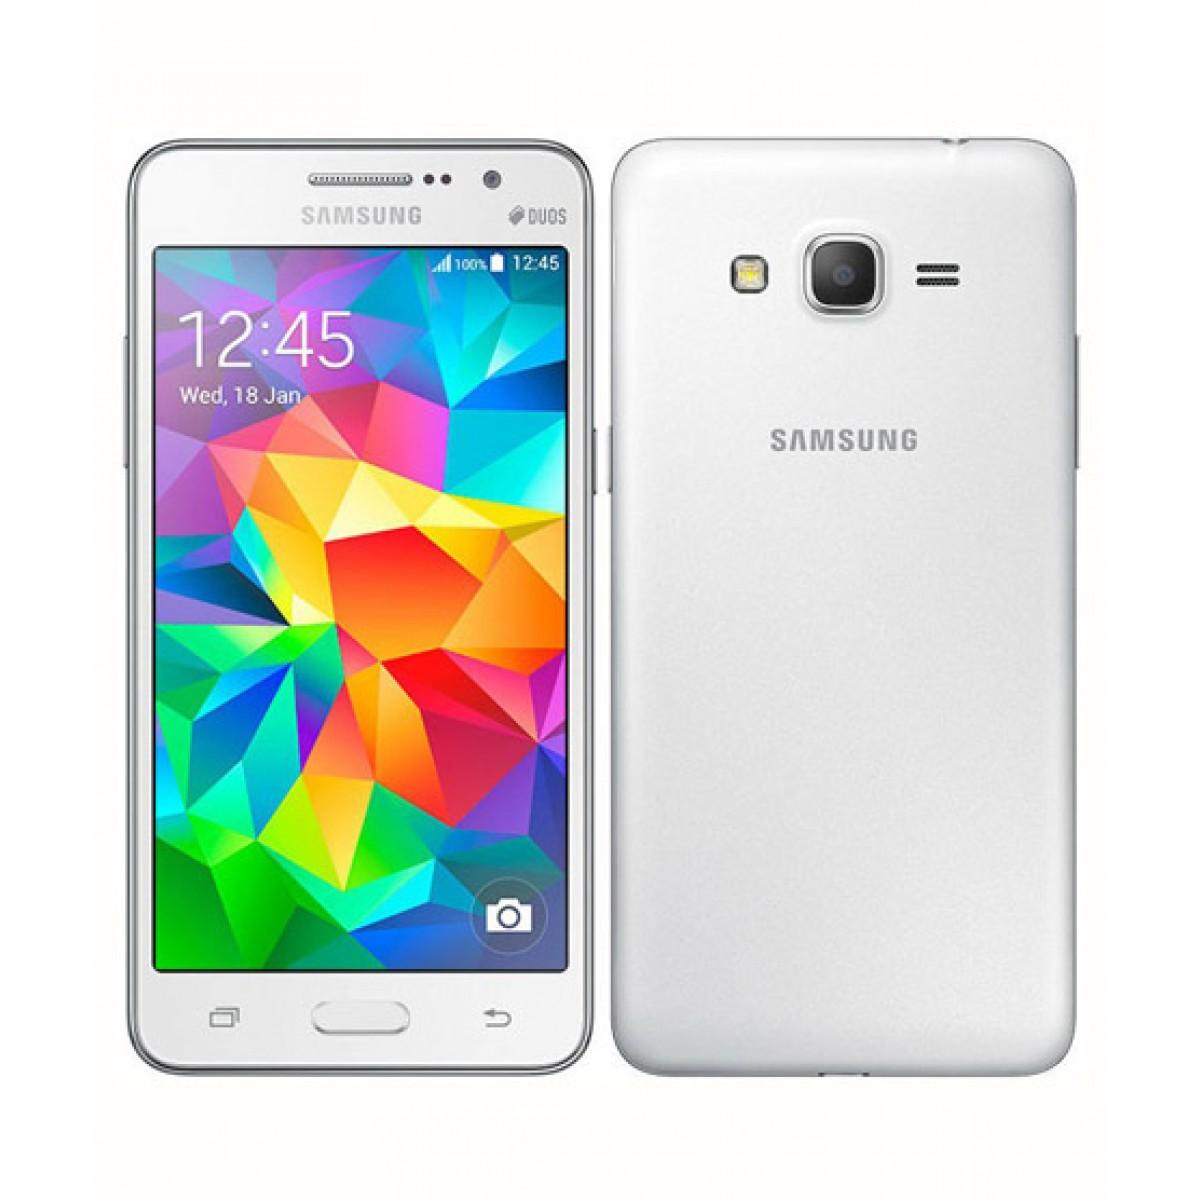 Samsung Galaxy Grand Prime 4G White (G530F)